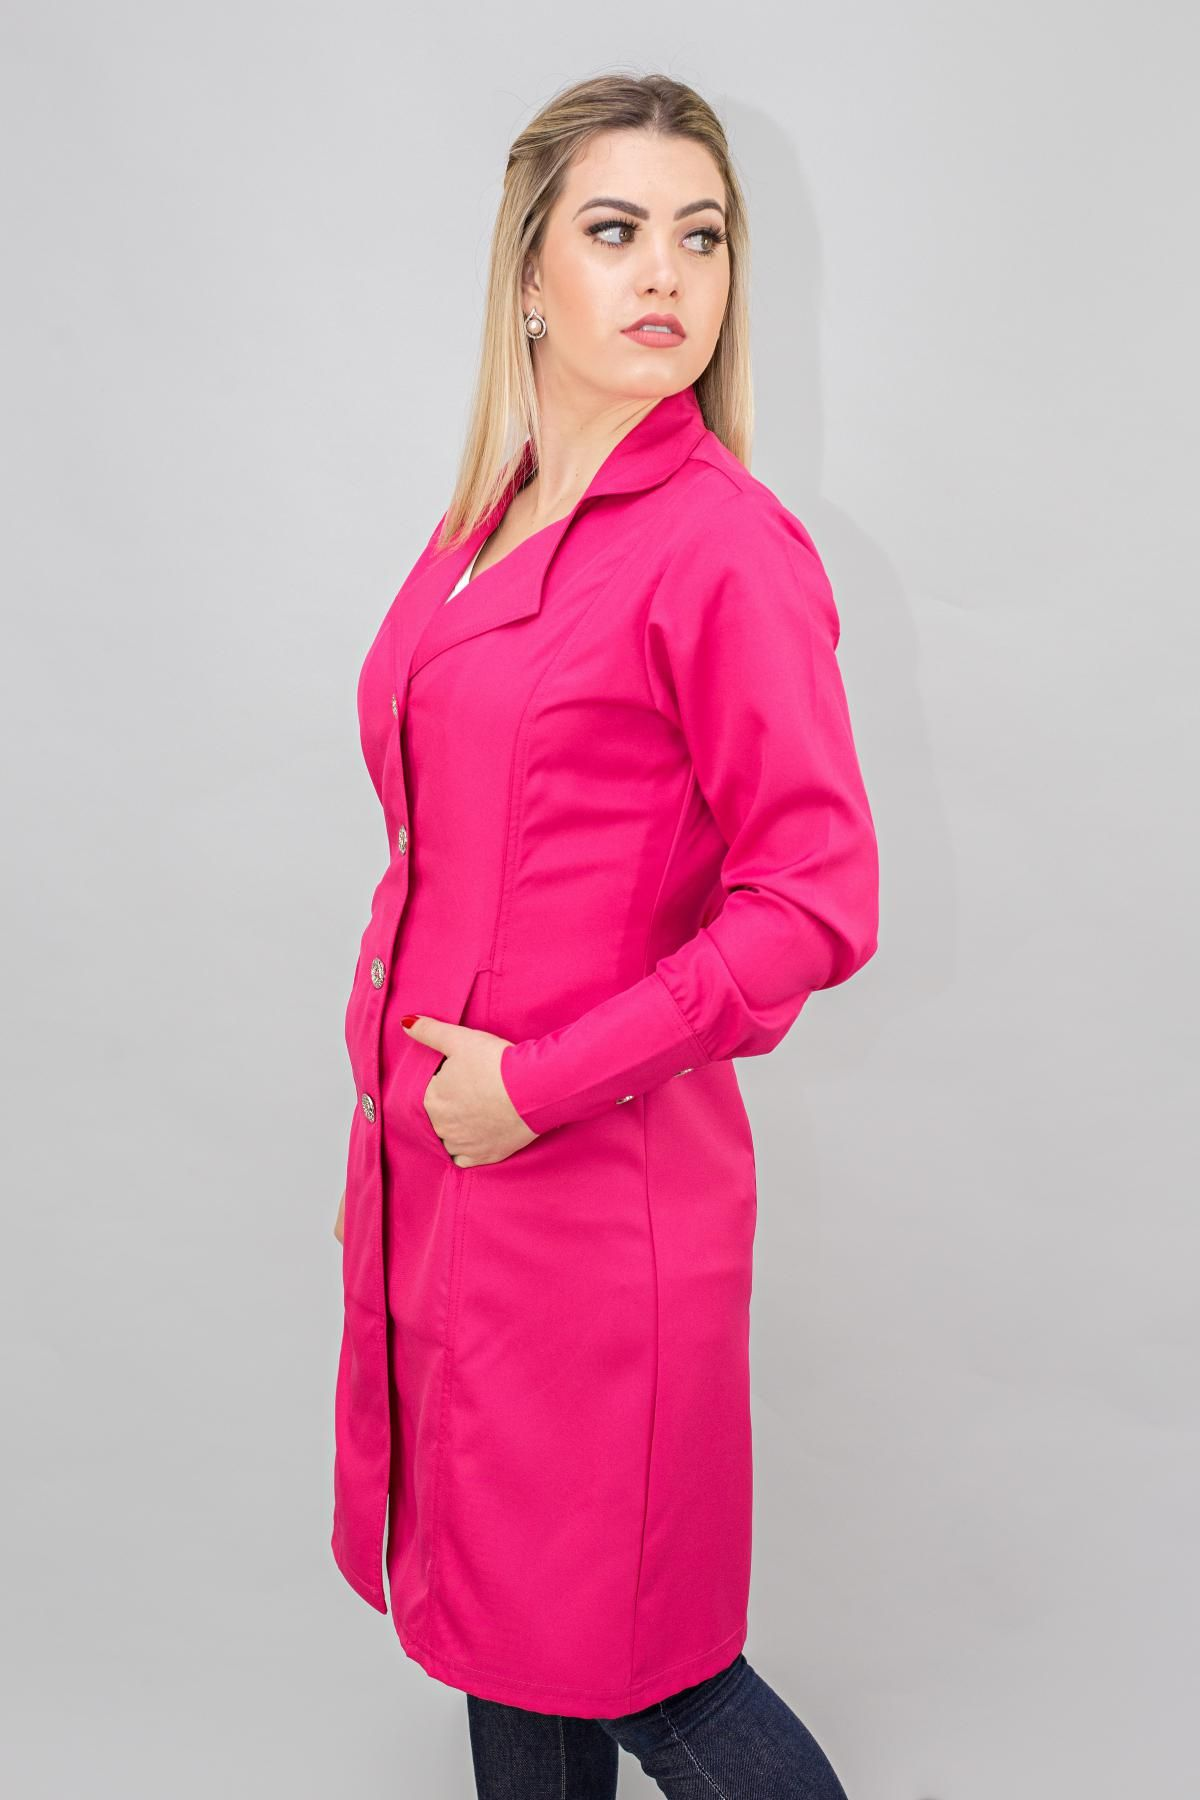 2b26493bc6 Jaleco feminino branco em gabardine Premium na cor Pink